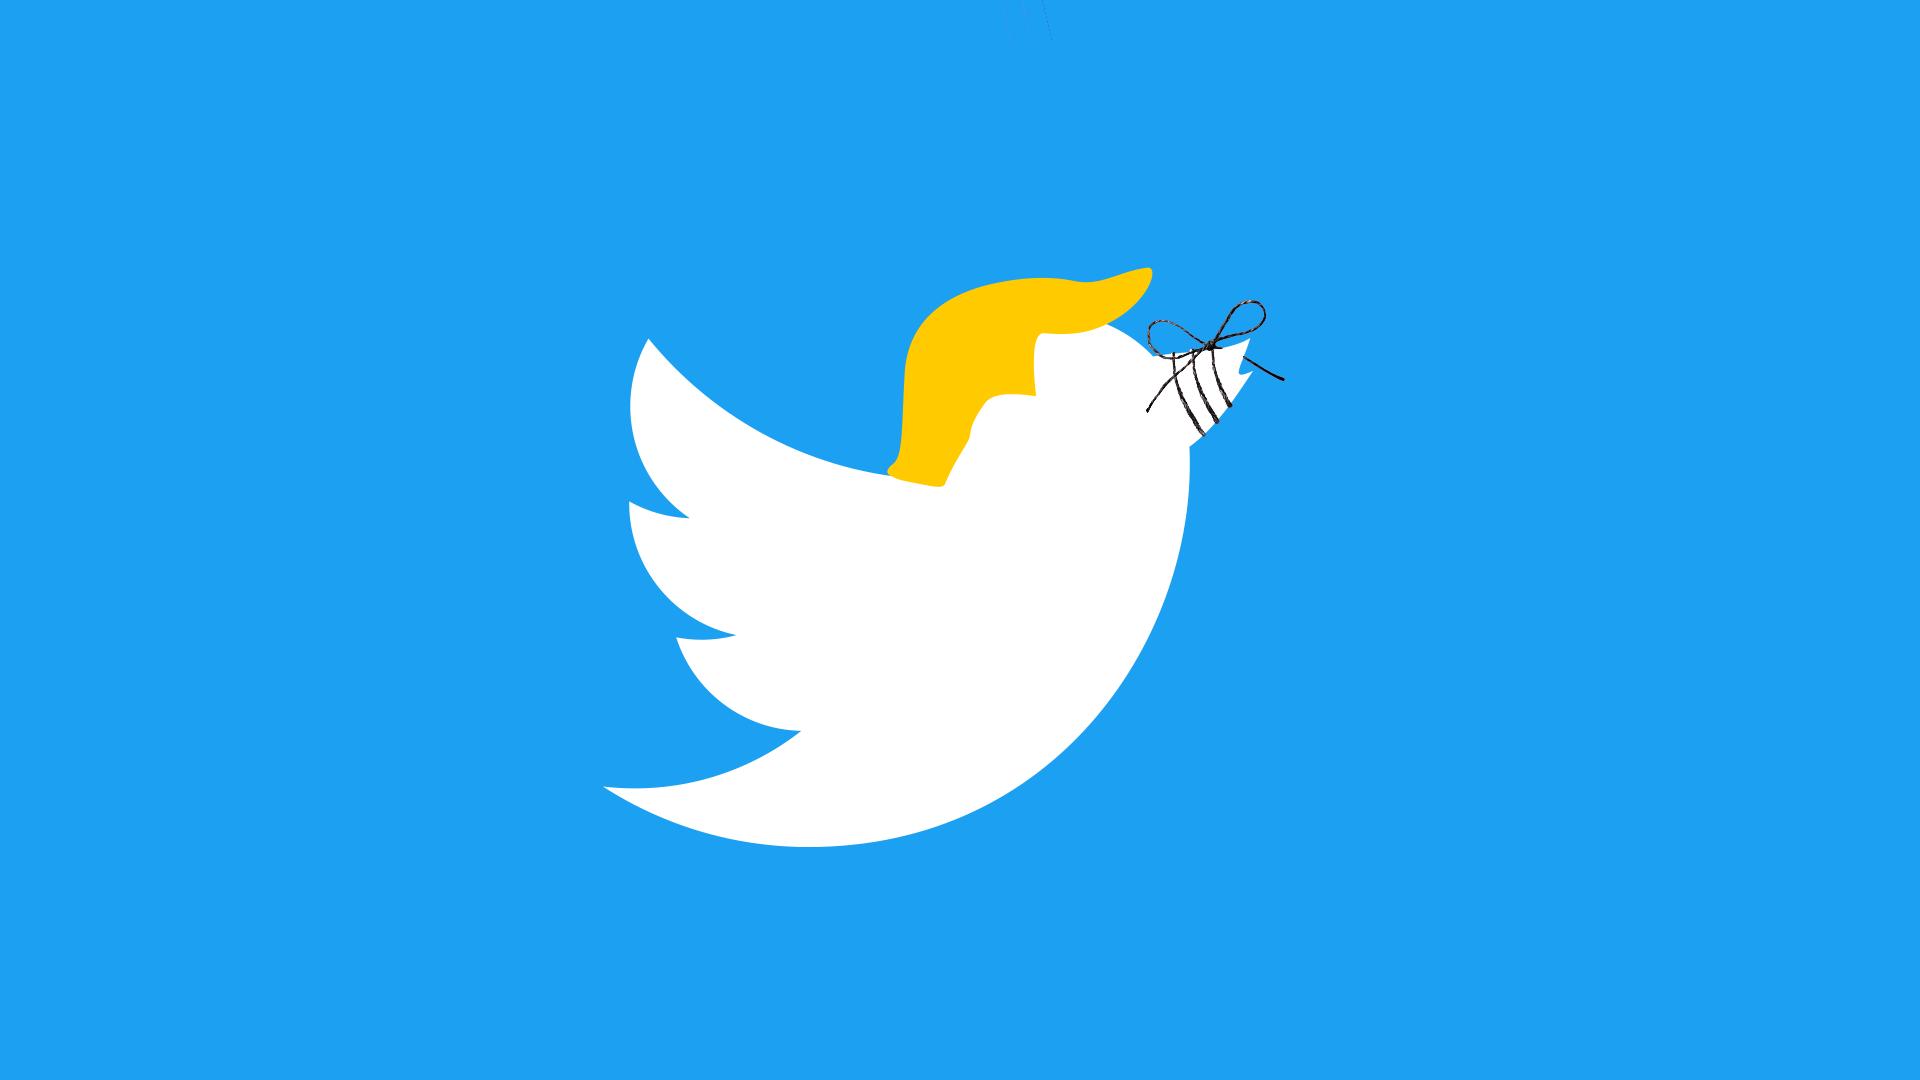 Twitter logo as Trump illustration